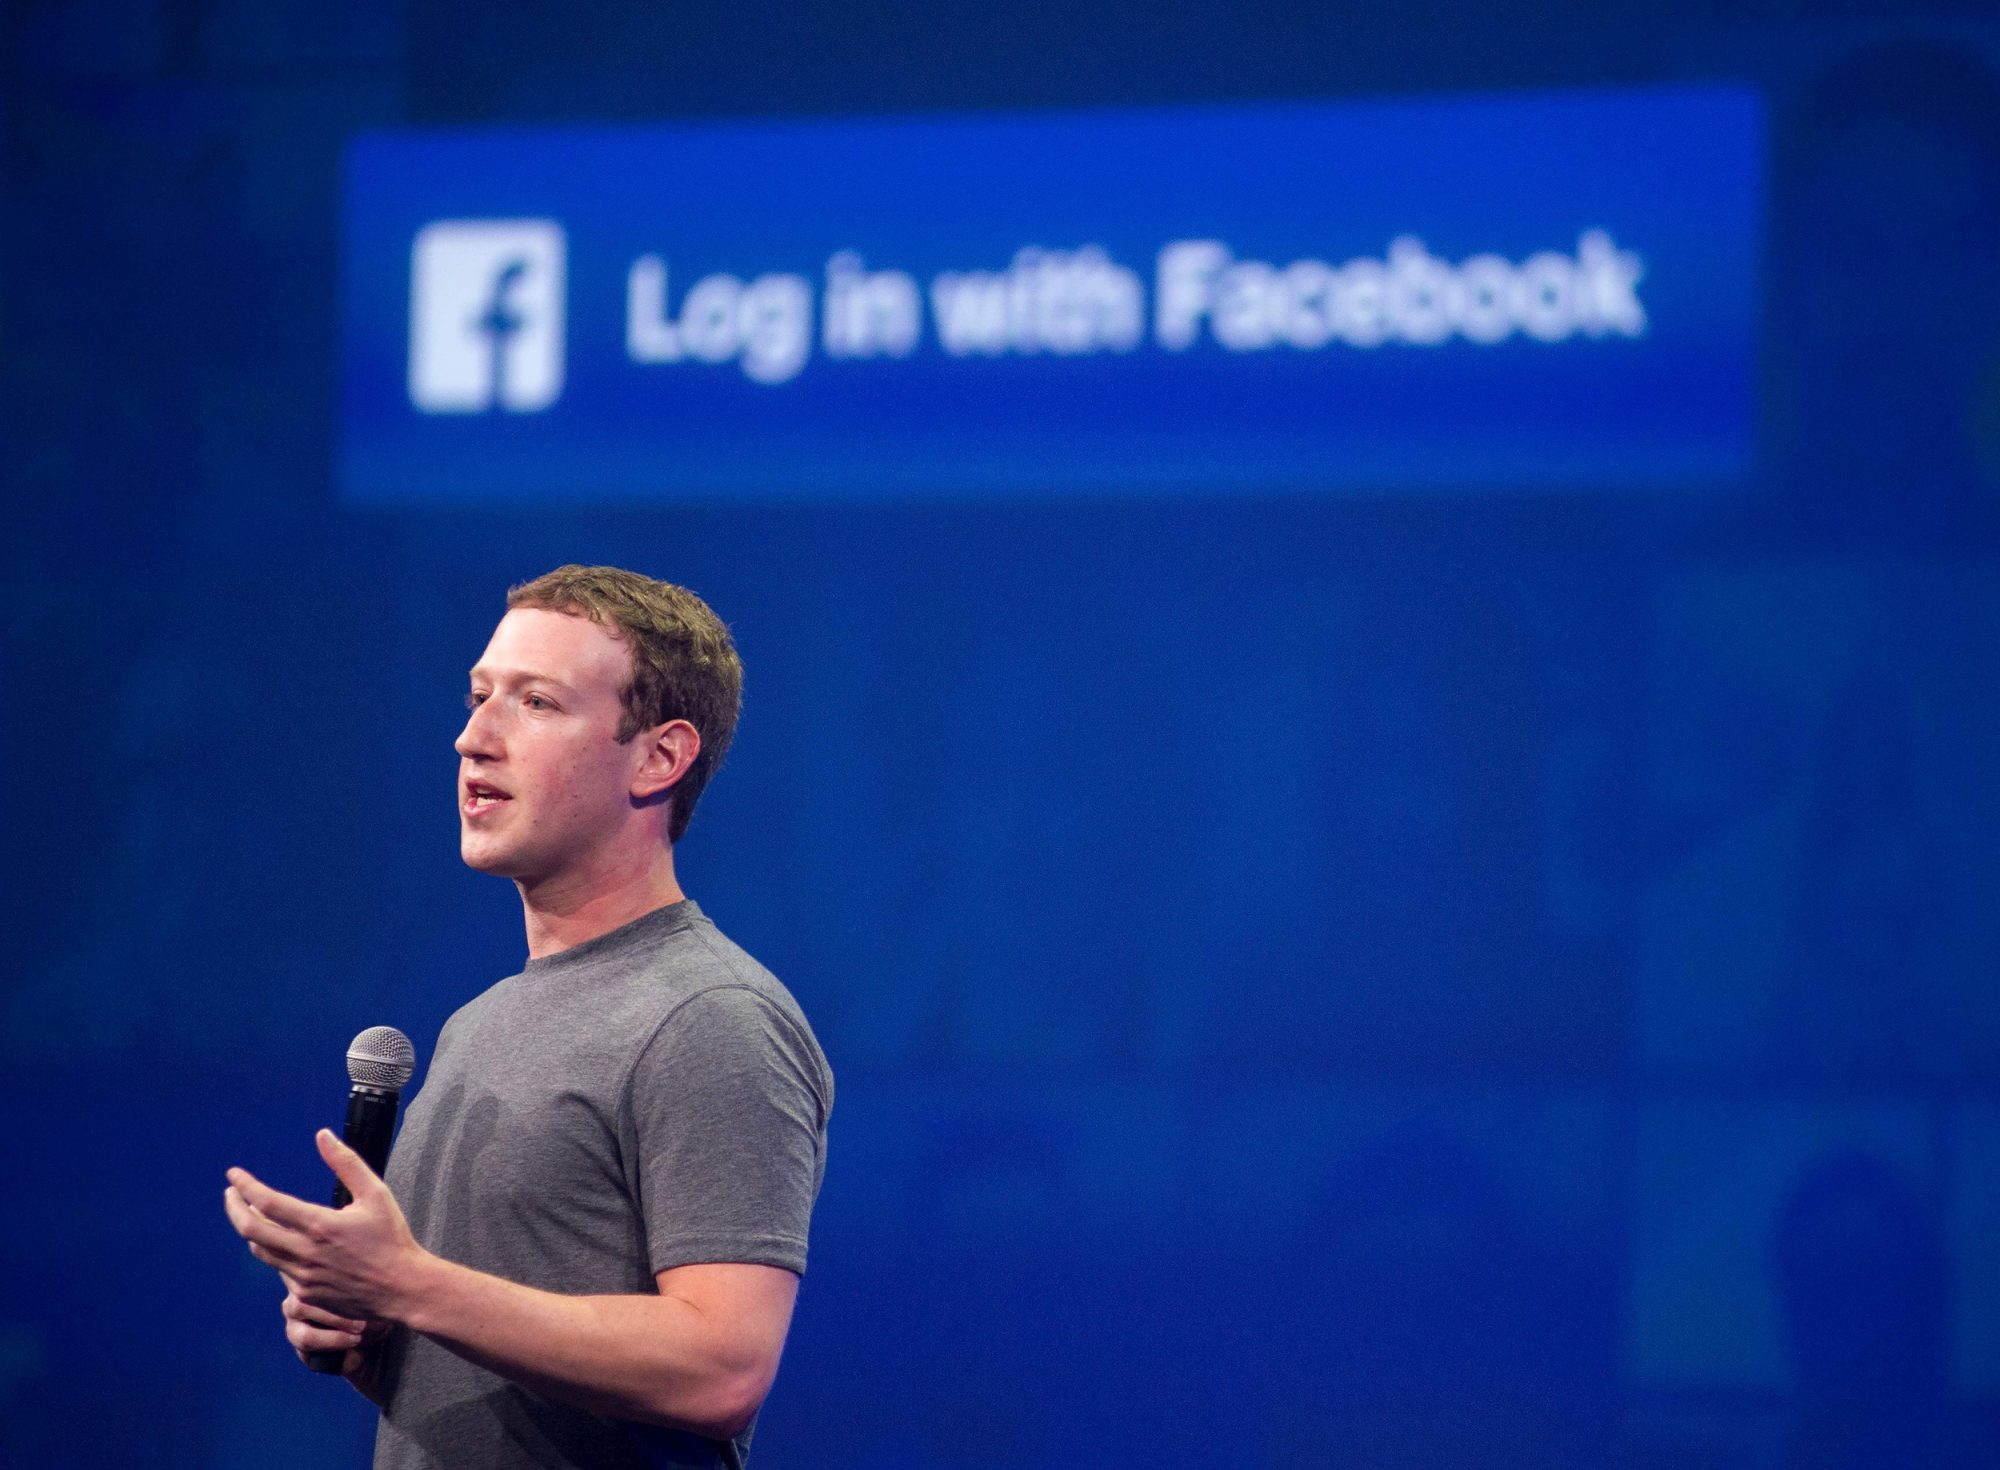 Facebook spent over $13 bln on safety, security